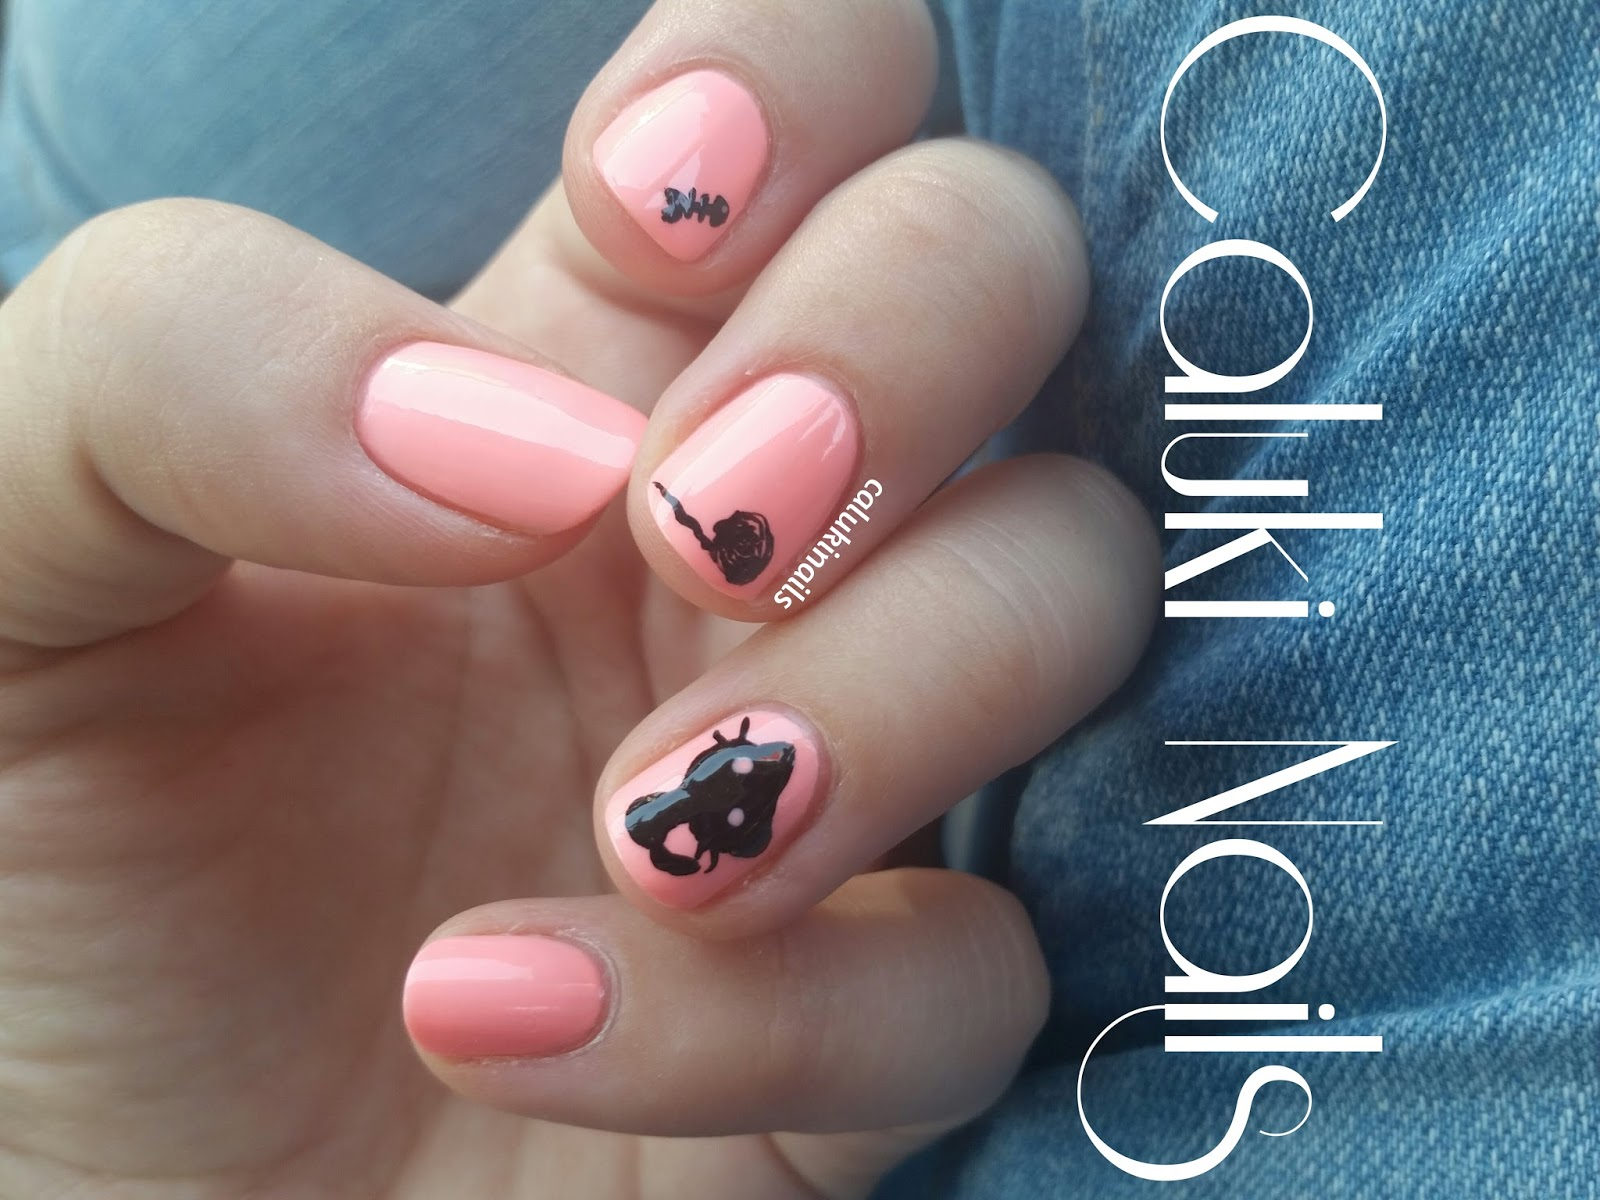 Caluki Nails : Nail art Gato | Amable de Masglo